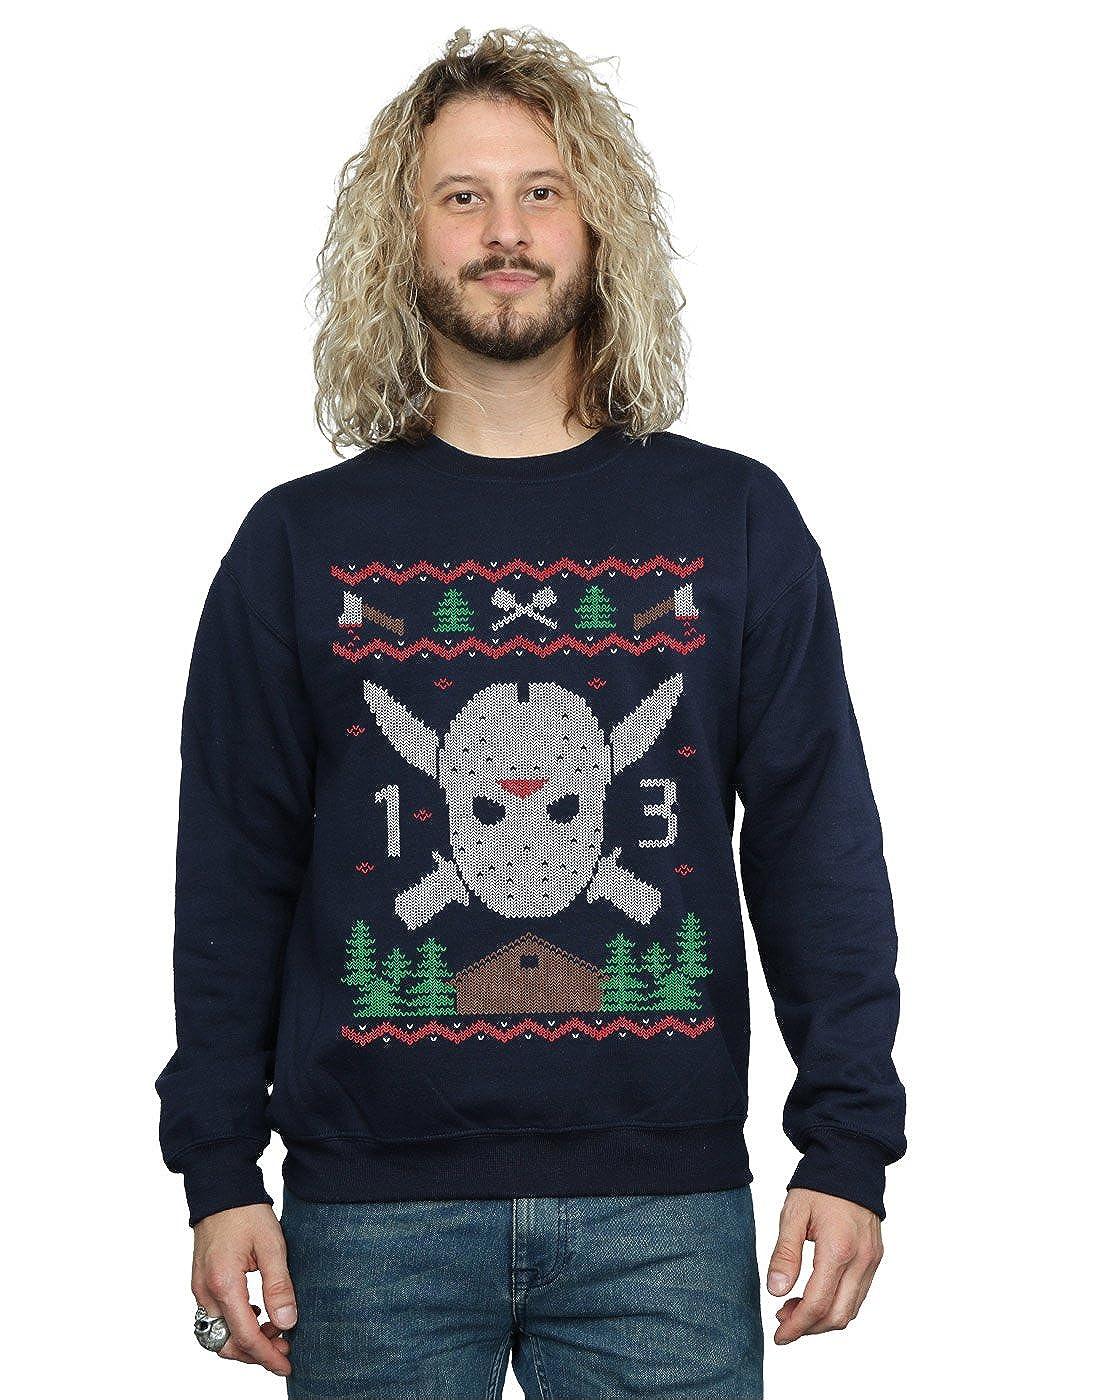 friday 13th sweatshirt christmas sweater hoodie t shirt jason voorhees camp